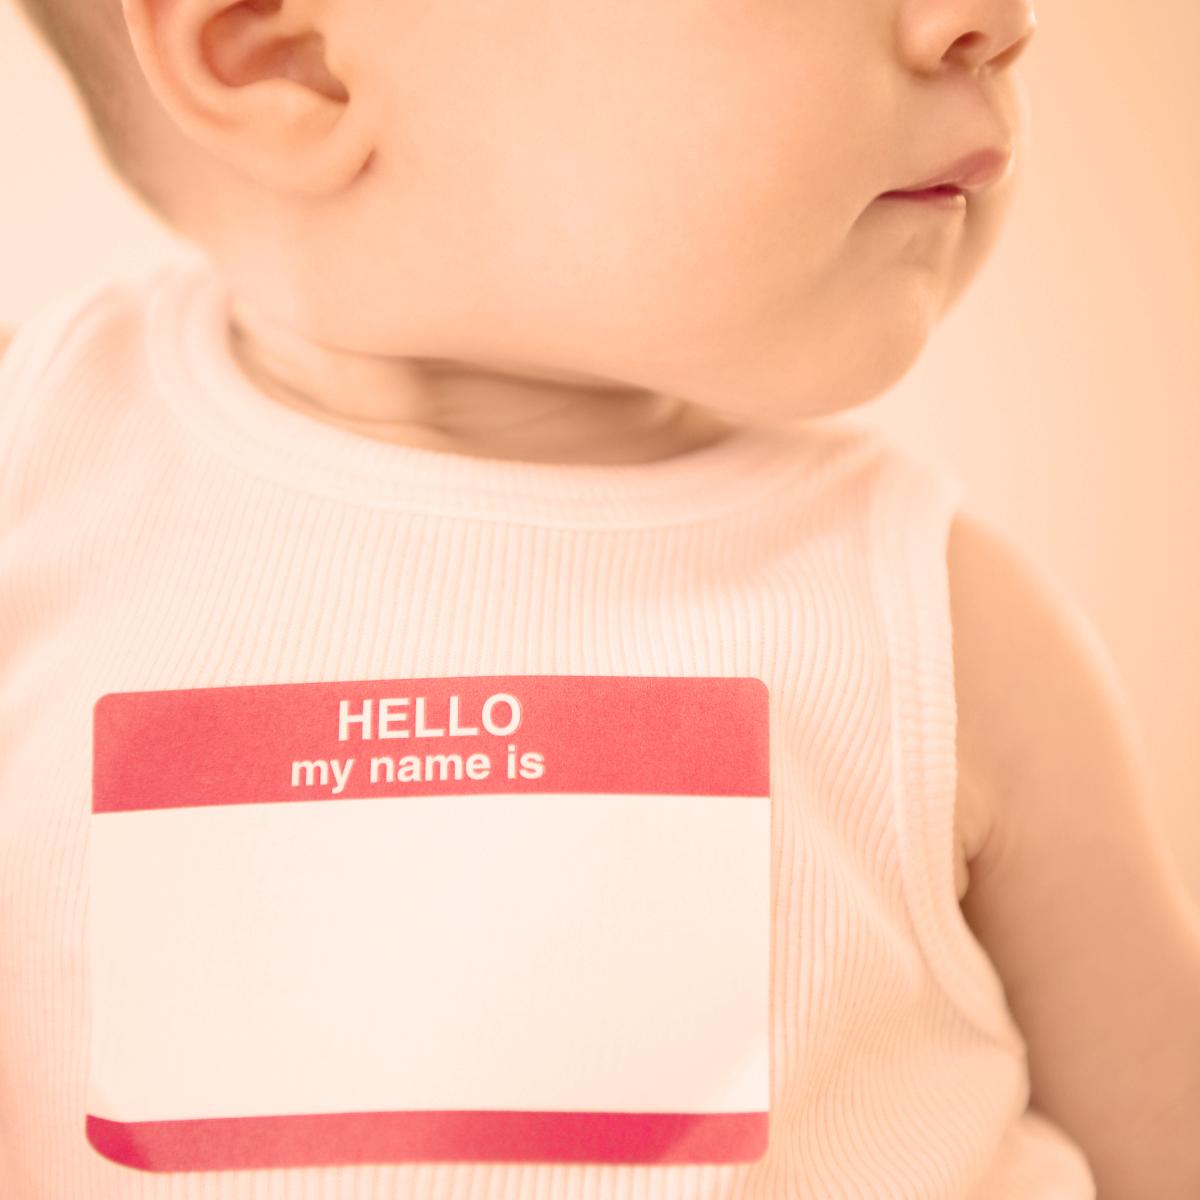 Baby brand name